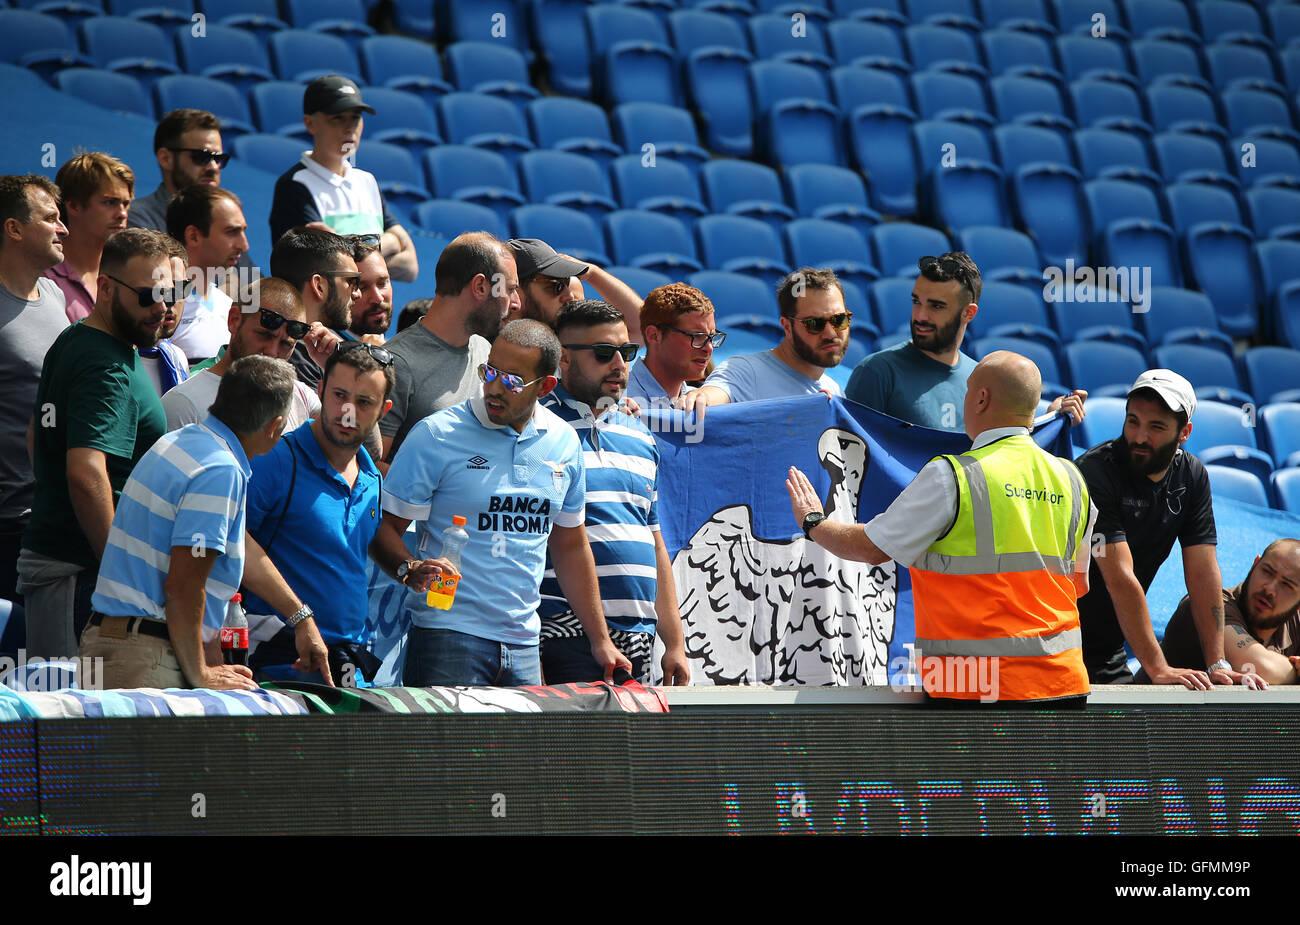 American Express Stadium, Brighton, Great Britain. 31st July 2016. Lazio fans speak with a steward during a Pre Stock Photo